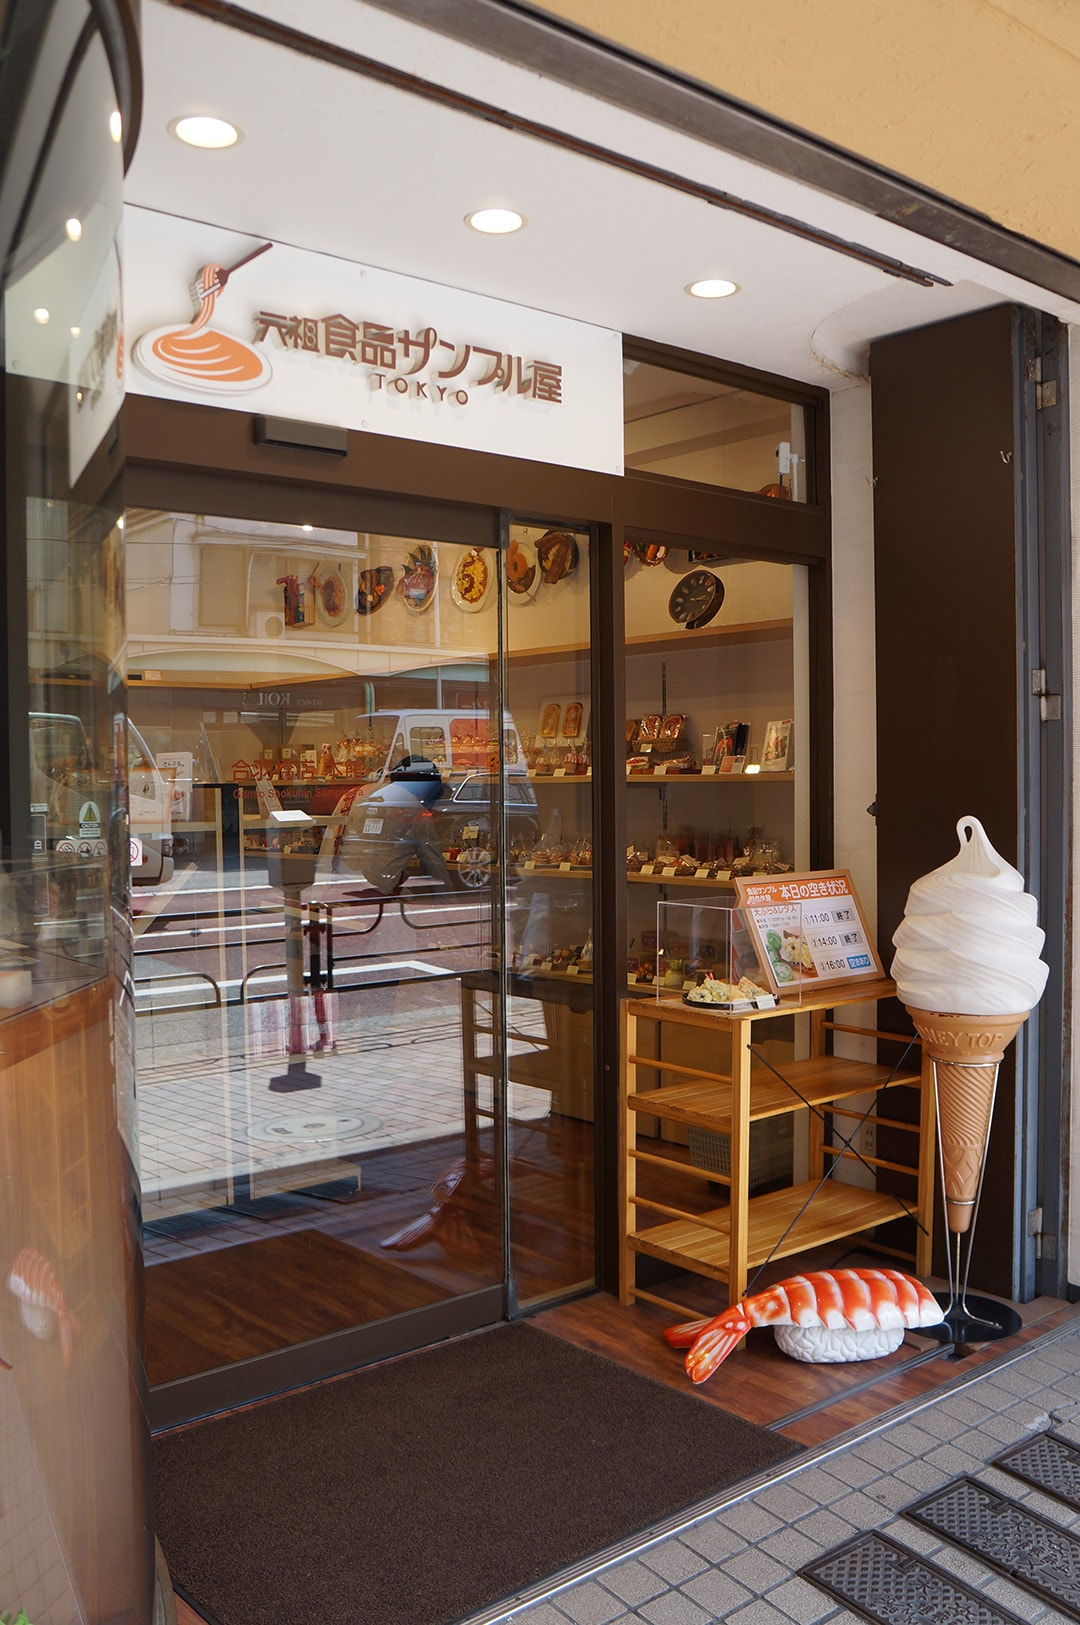 Ganso Shokuhin Sample-ya Kappabashi Store